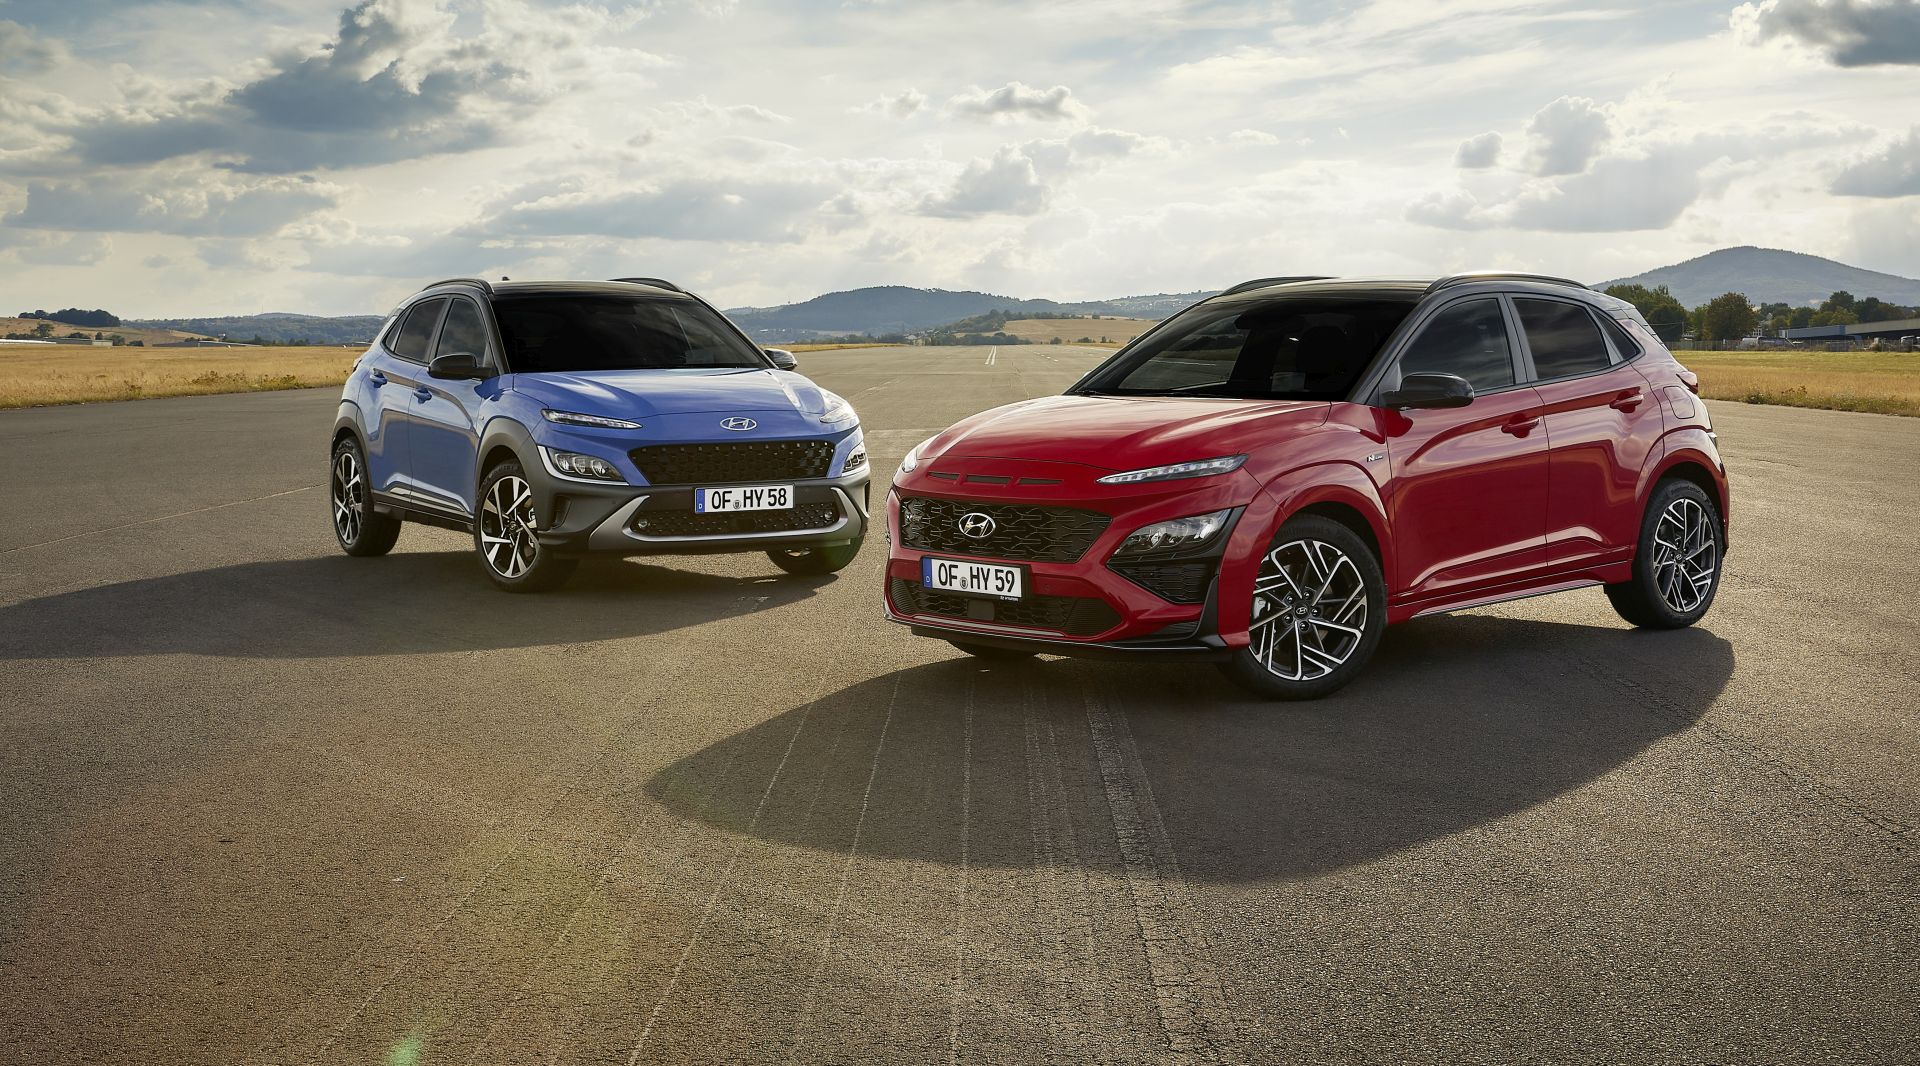 Osvježena Hyundai Kona i s N-Line opremom, a sportska Kona N stiže uskoro